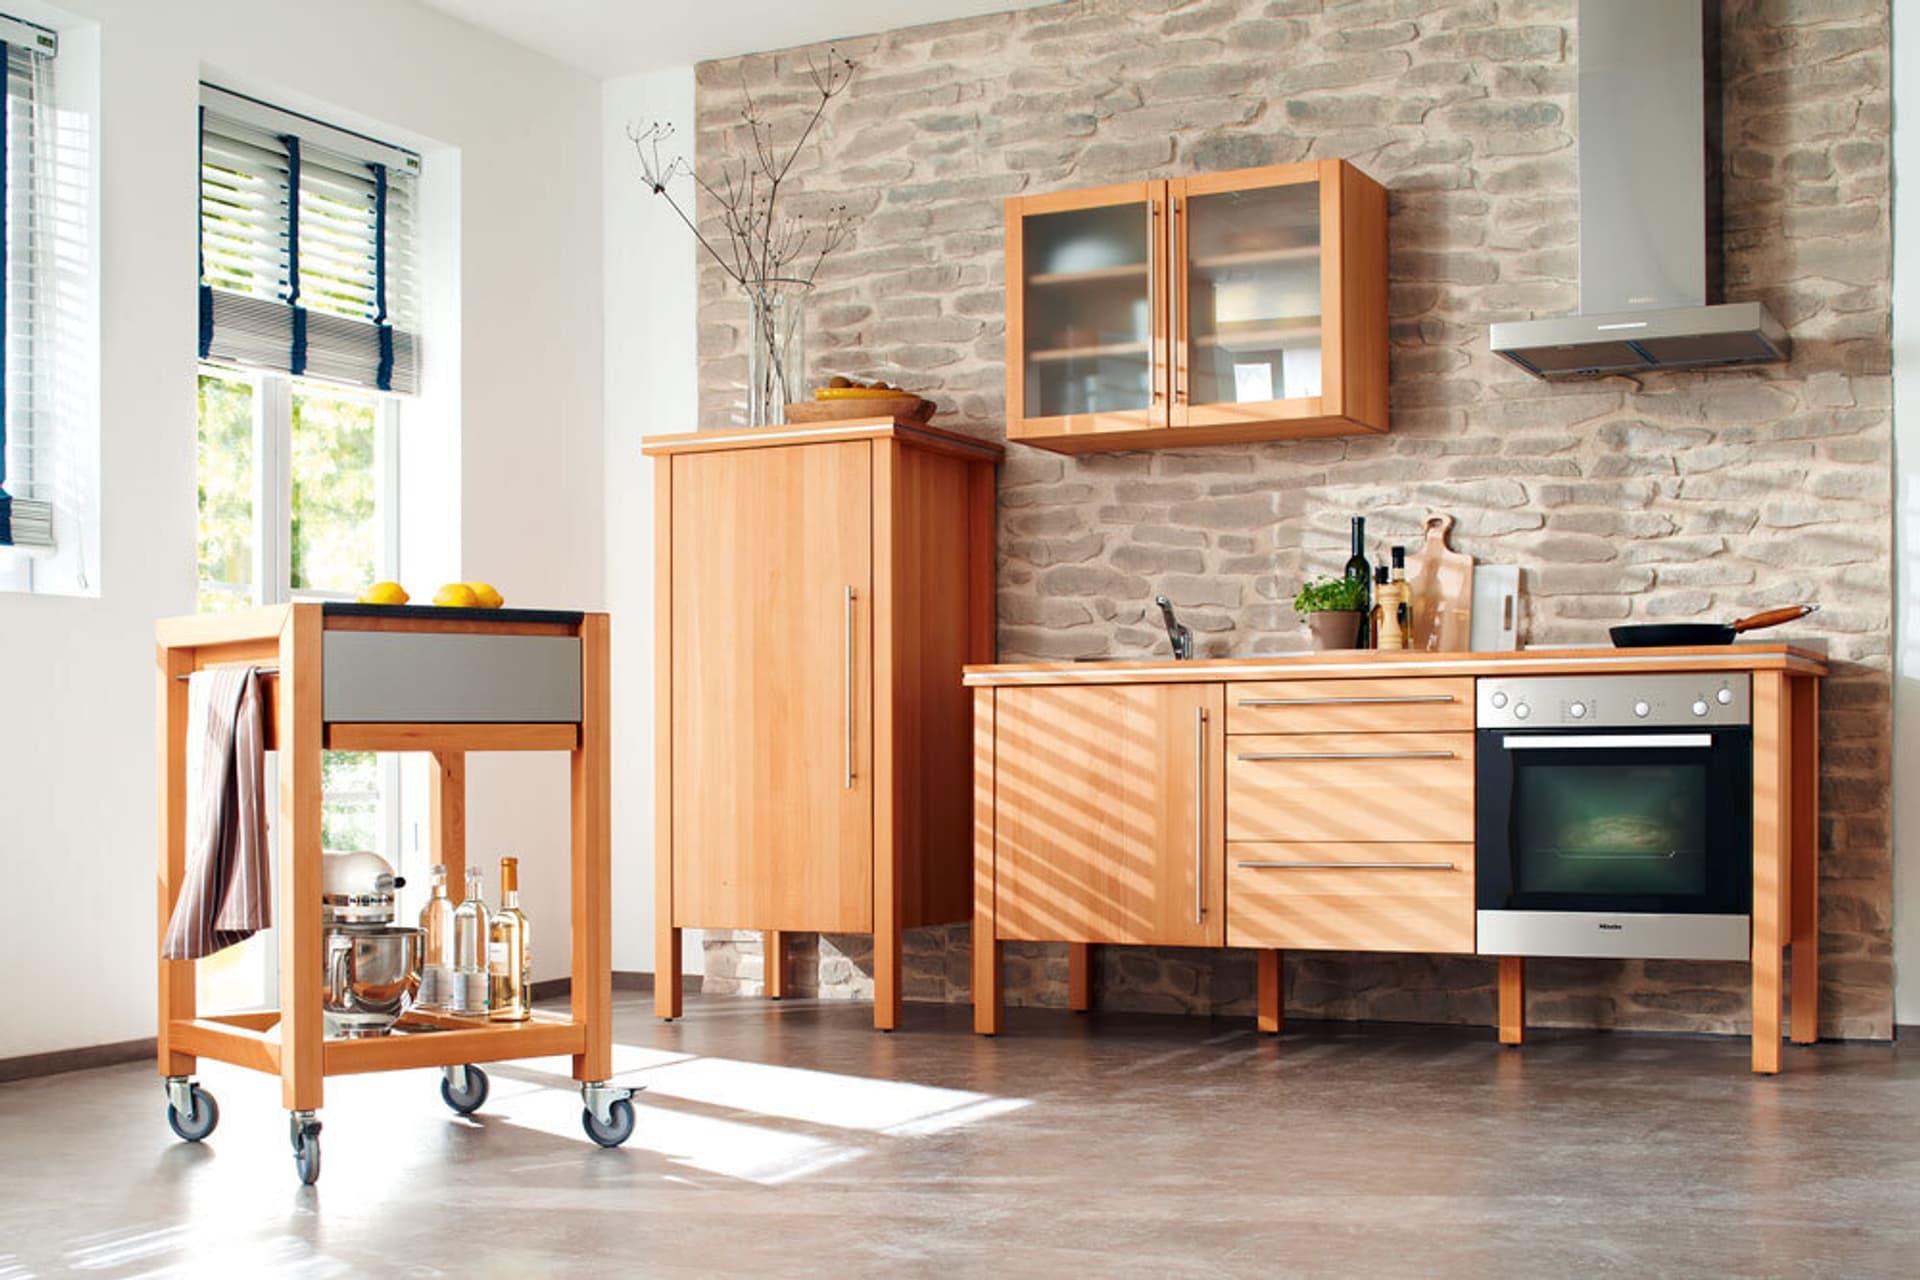 Küchenmöbel als Holz